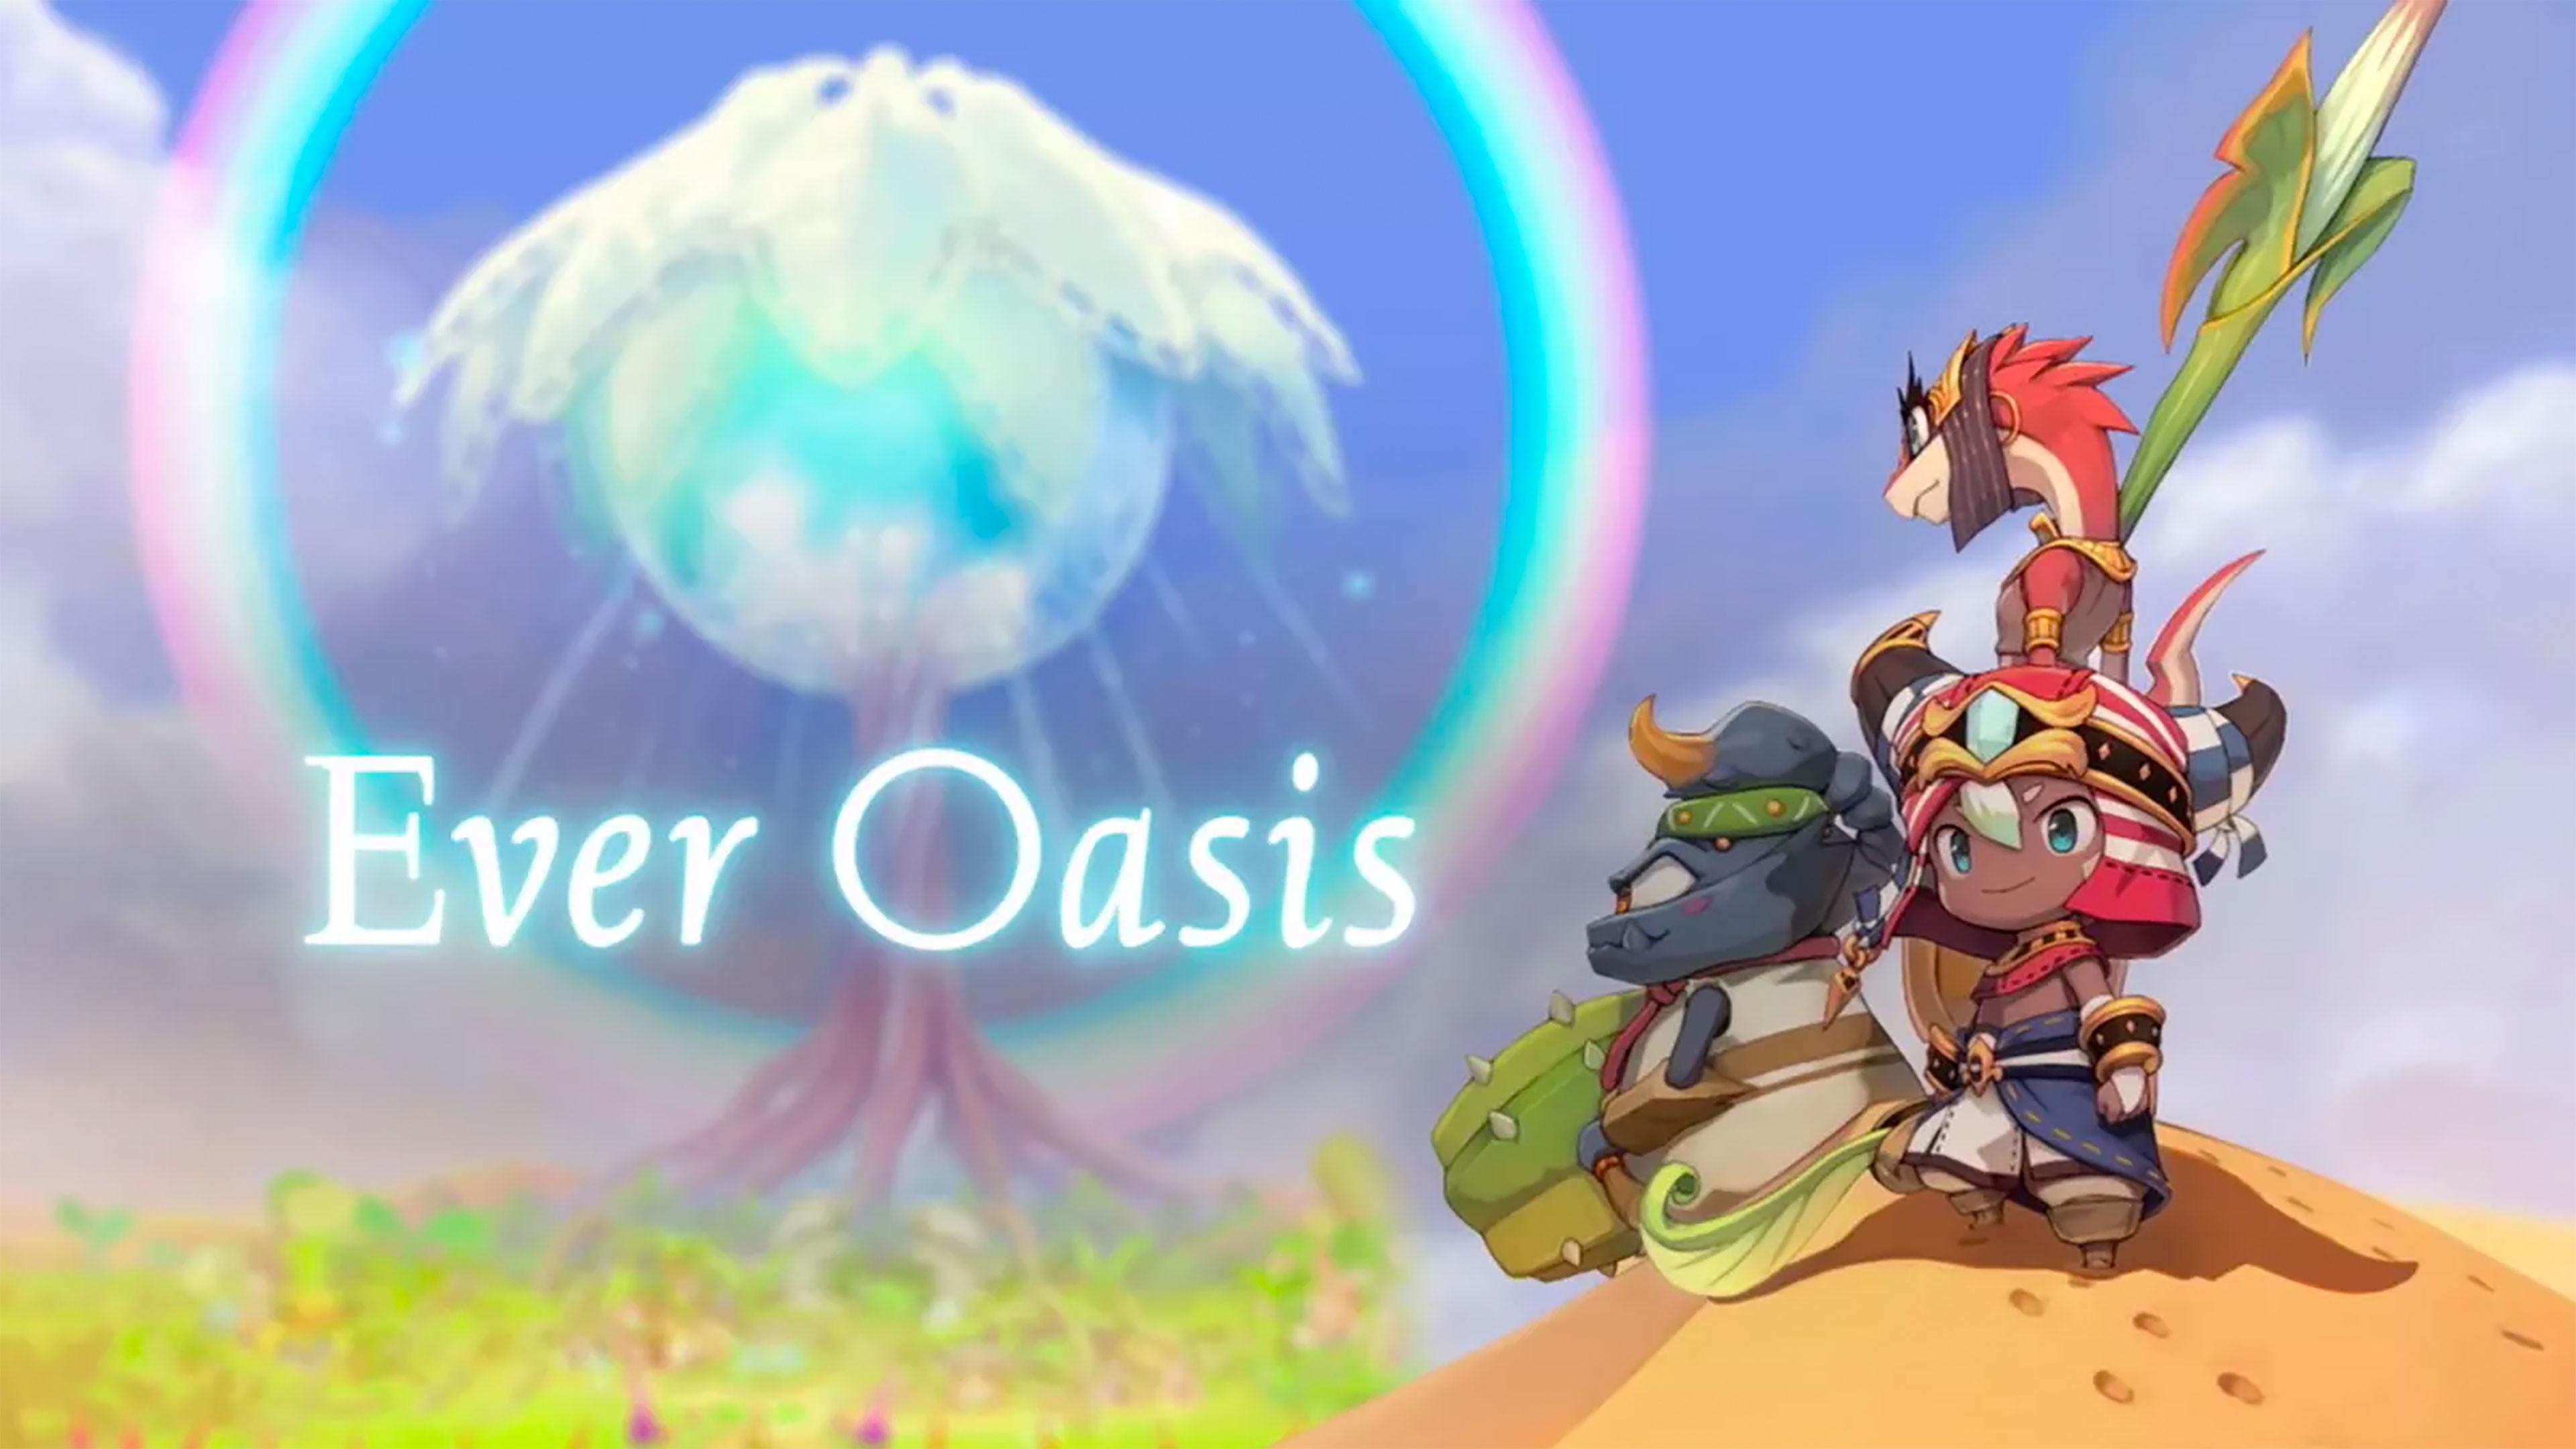 Res: 3840x2160, Ever Oasis 4K Wallpaper ...